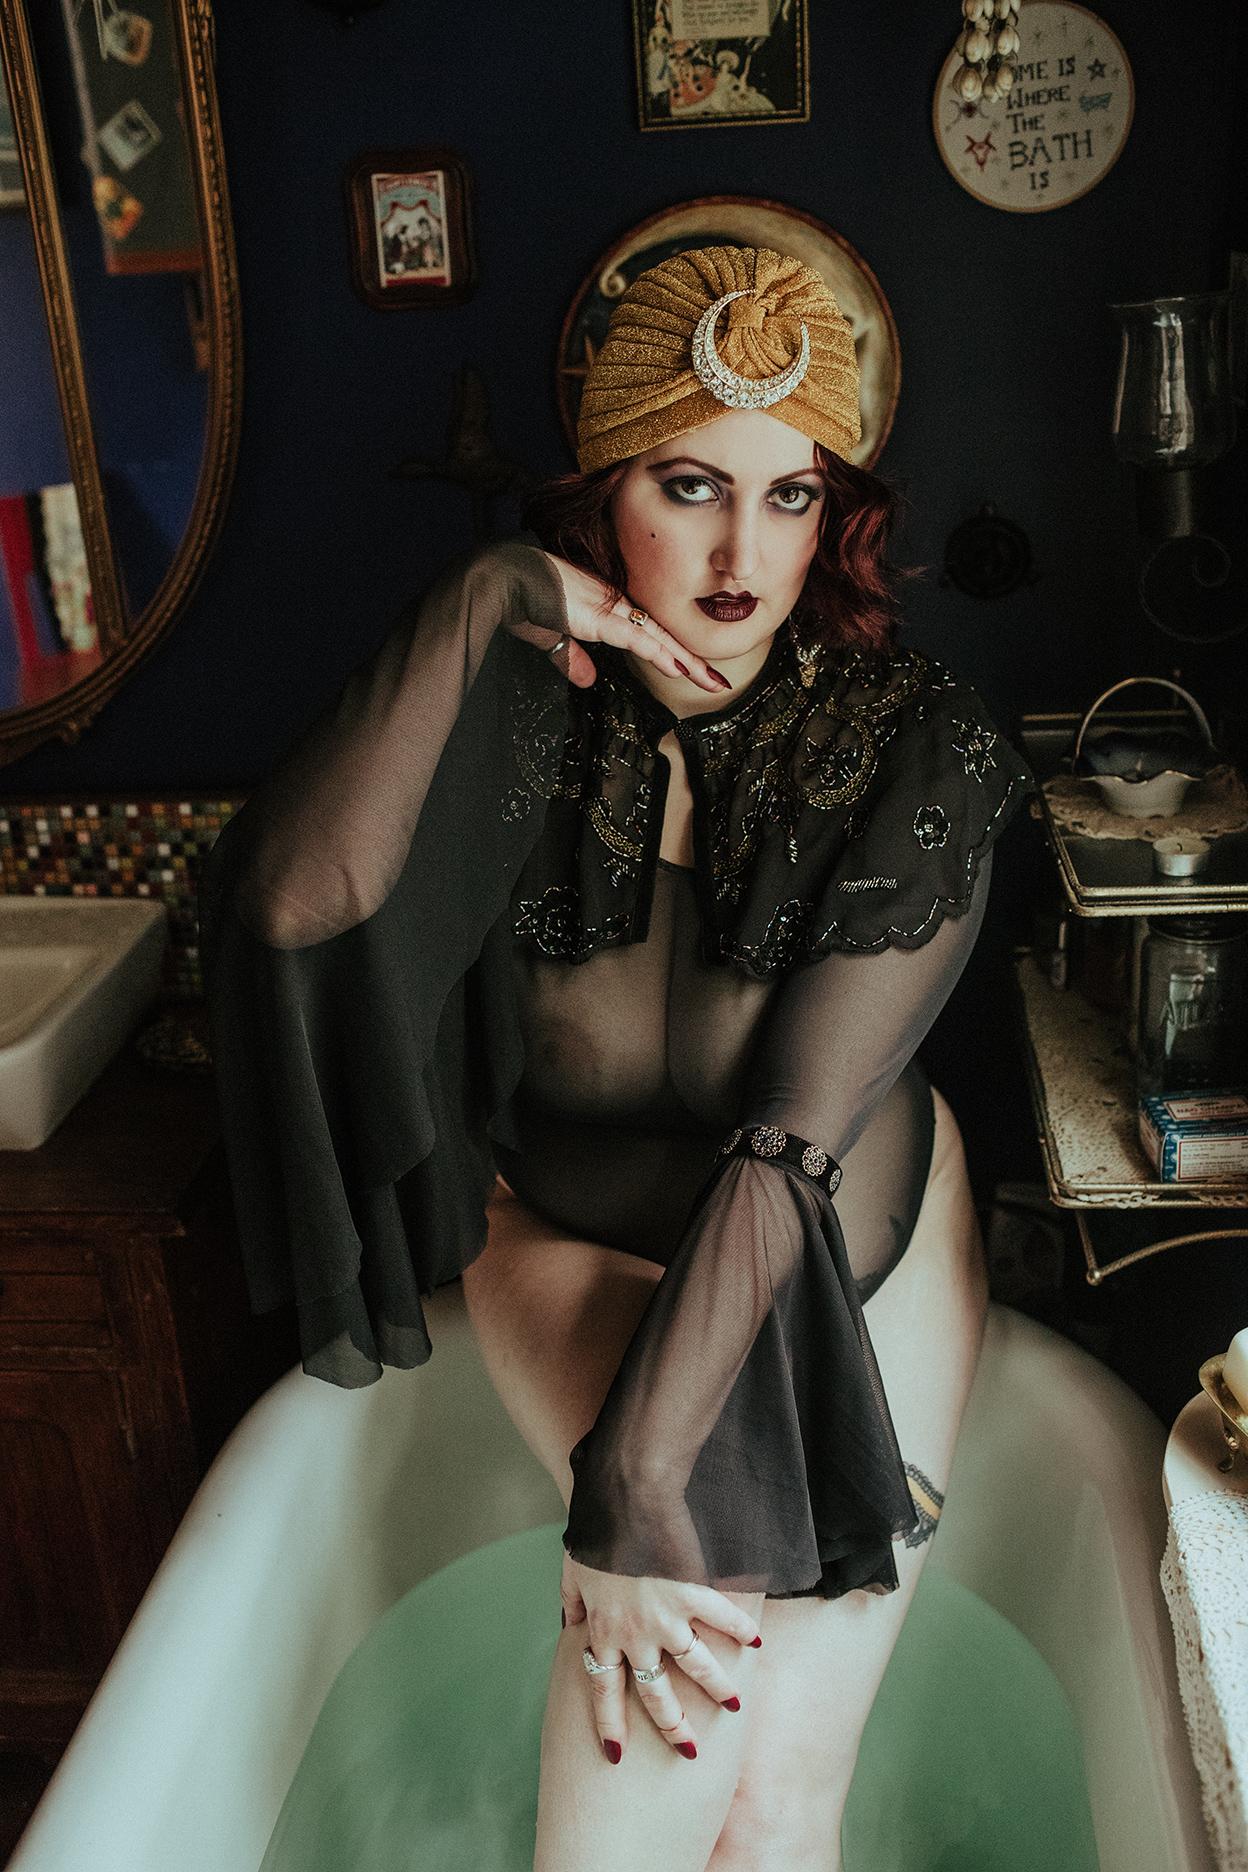 Victoria-BC-Boudoir-Photography-4.jpg